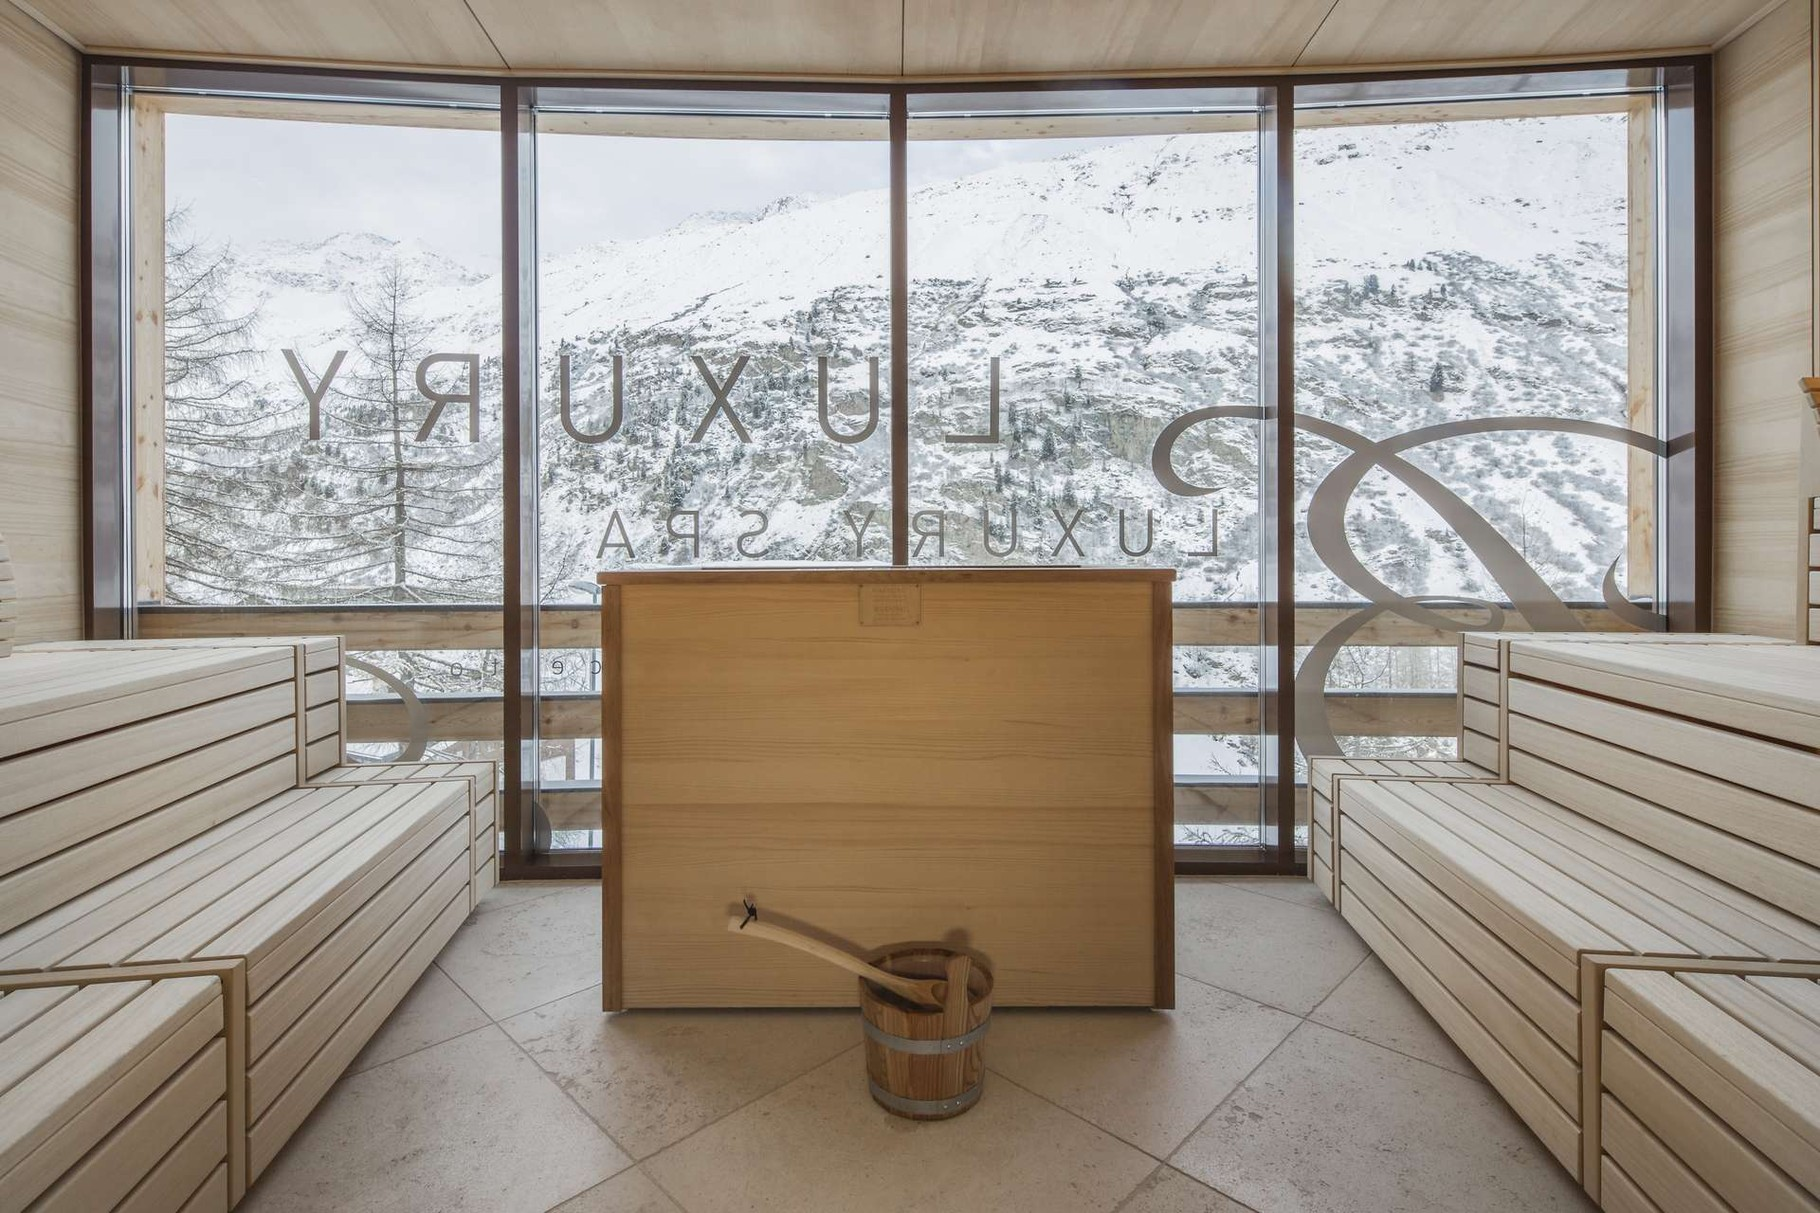 Art & Relax Hotel, Obergurgl in Österreich